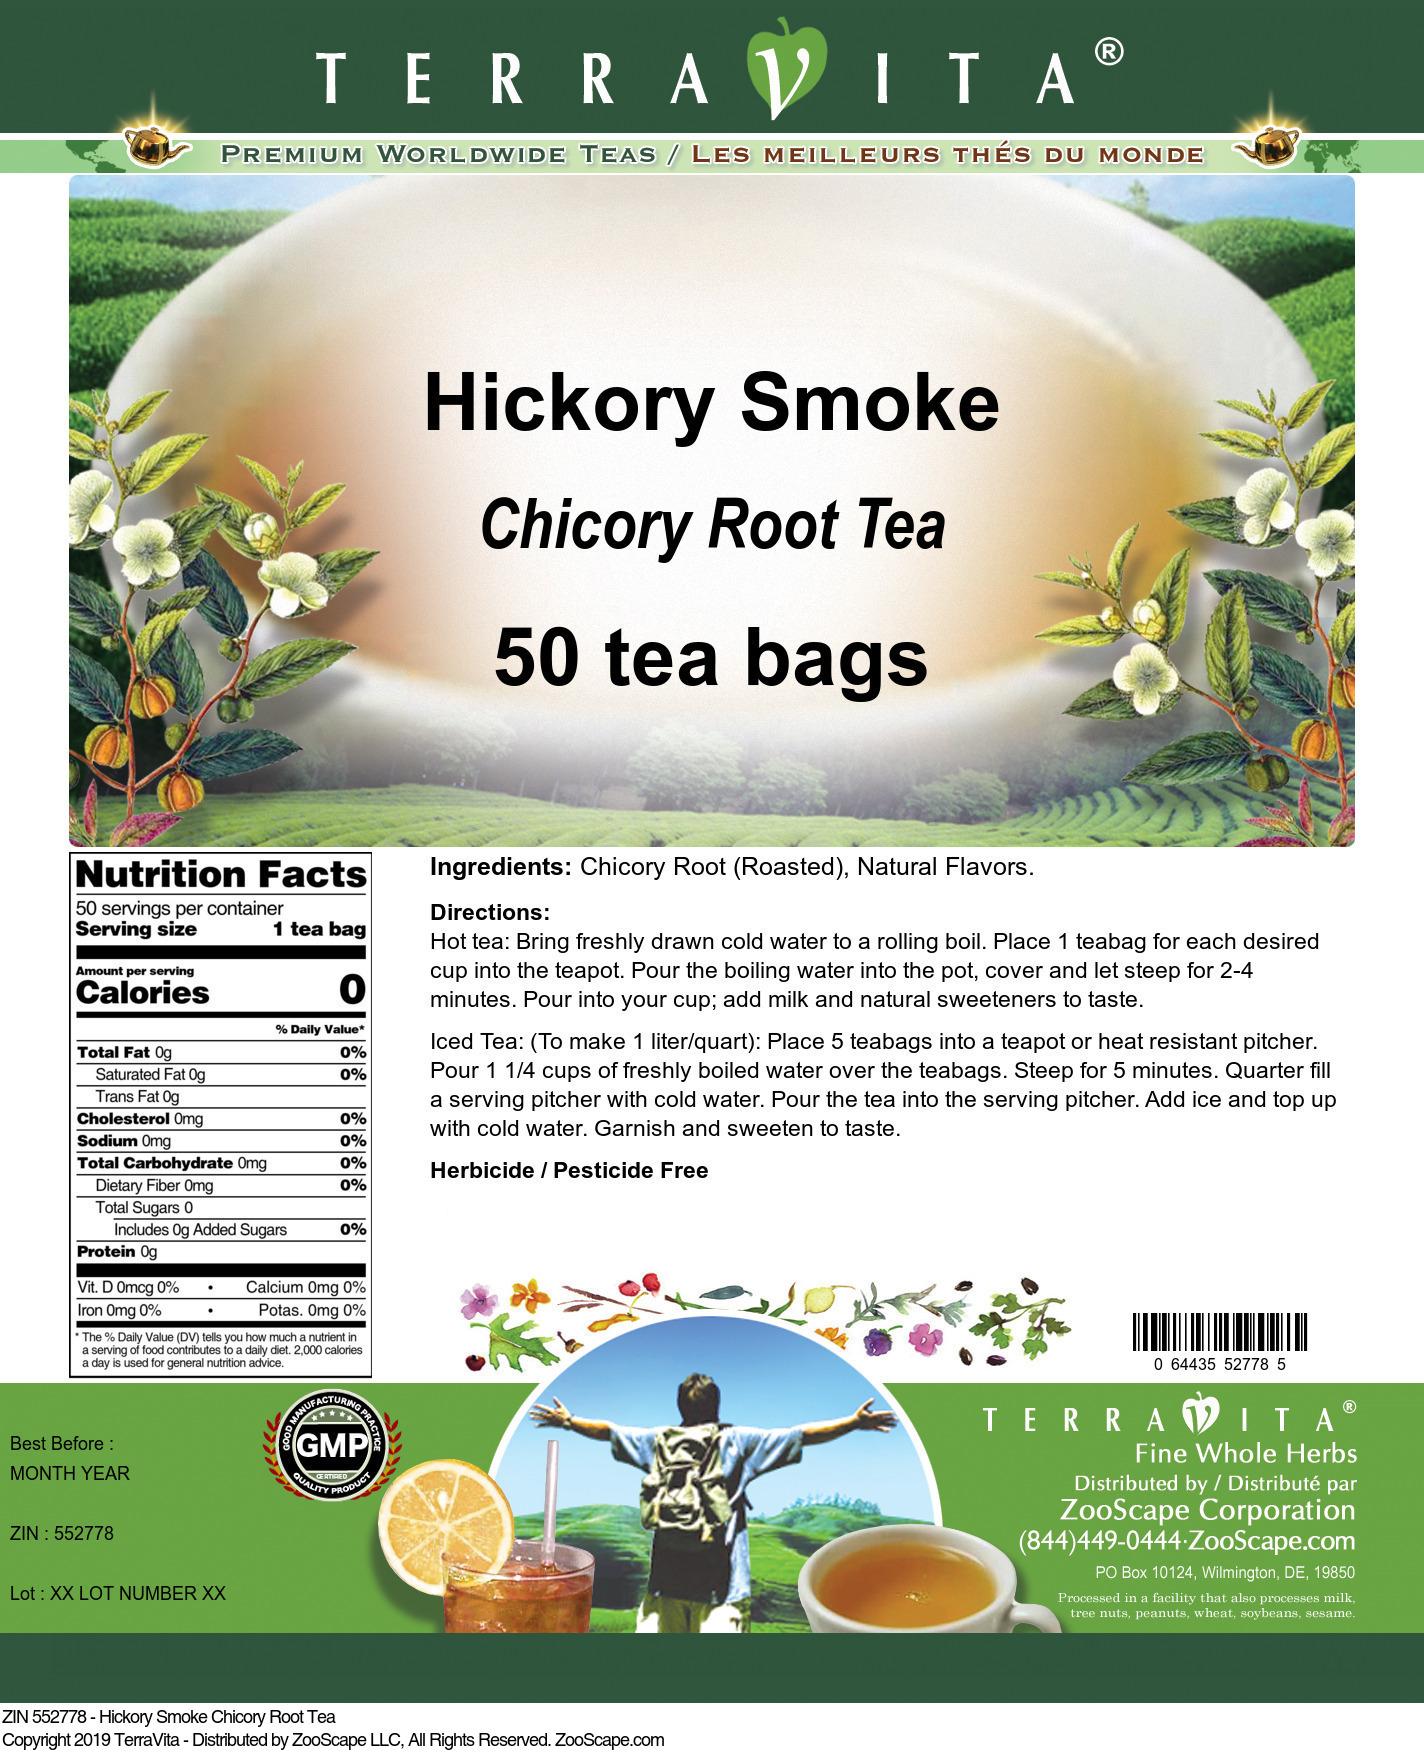 Hickory Smoke Chicory Root